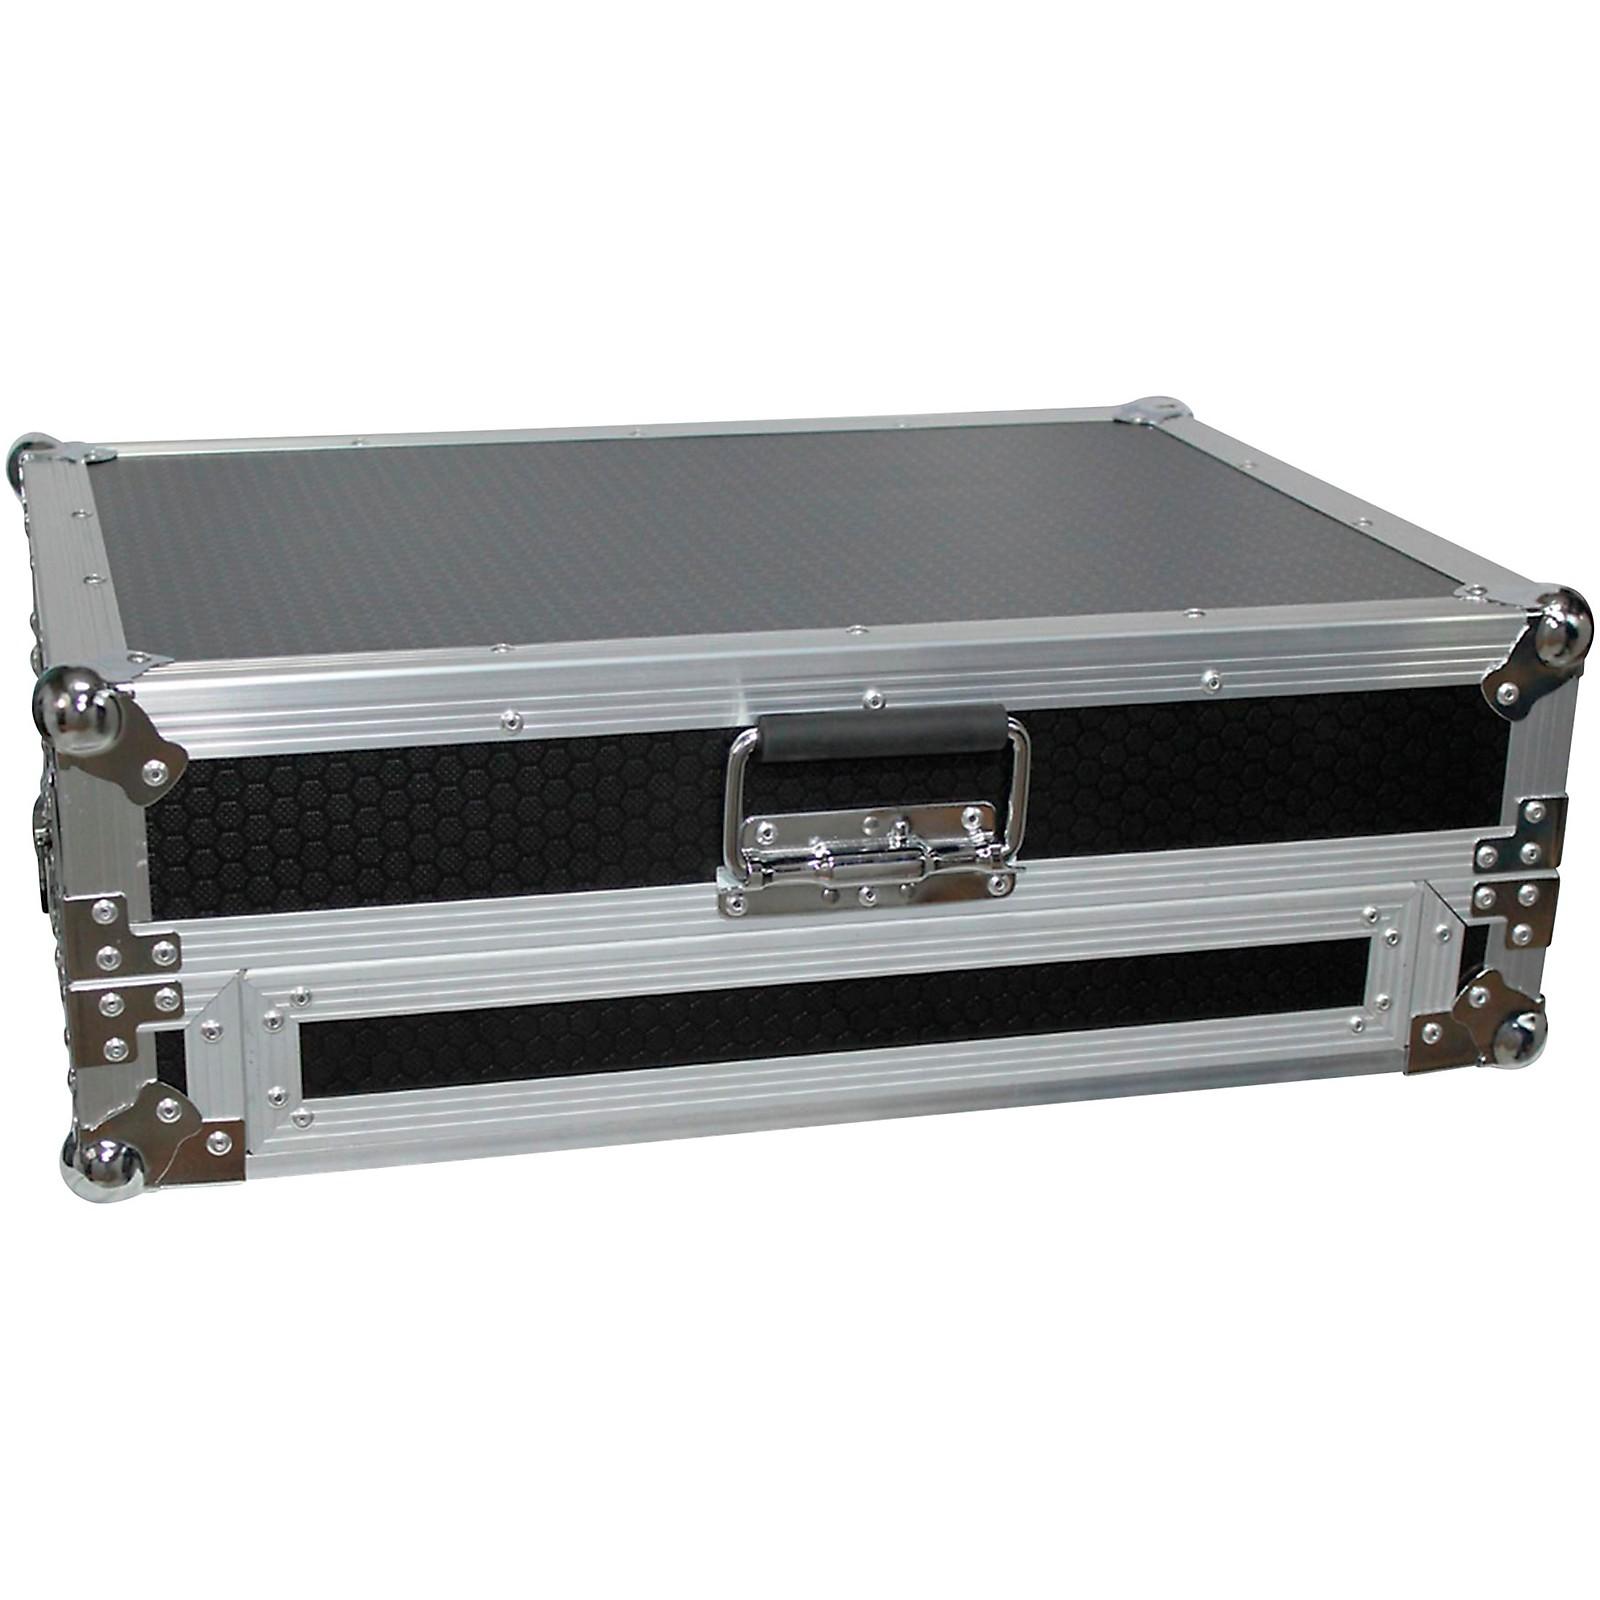 ProX ATA Professional Road Flight Case for Denon DN-MC4000 DJ Controller